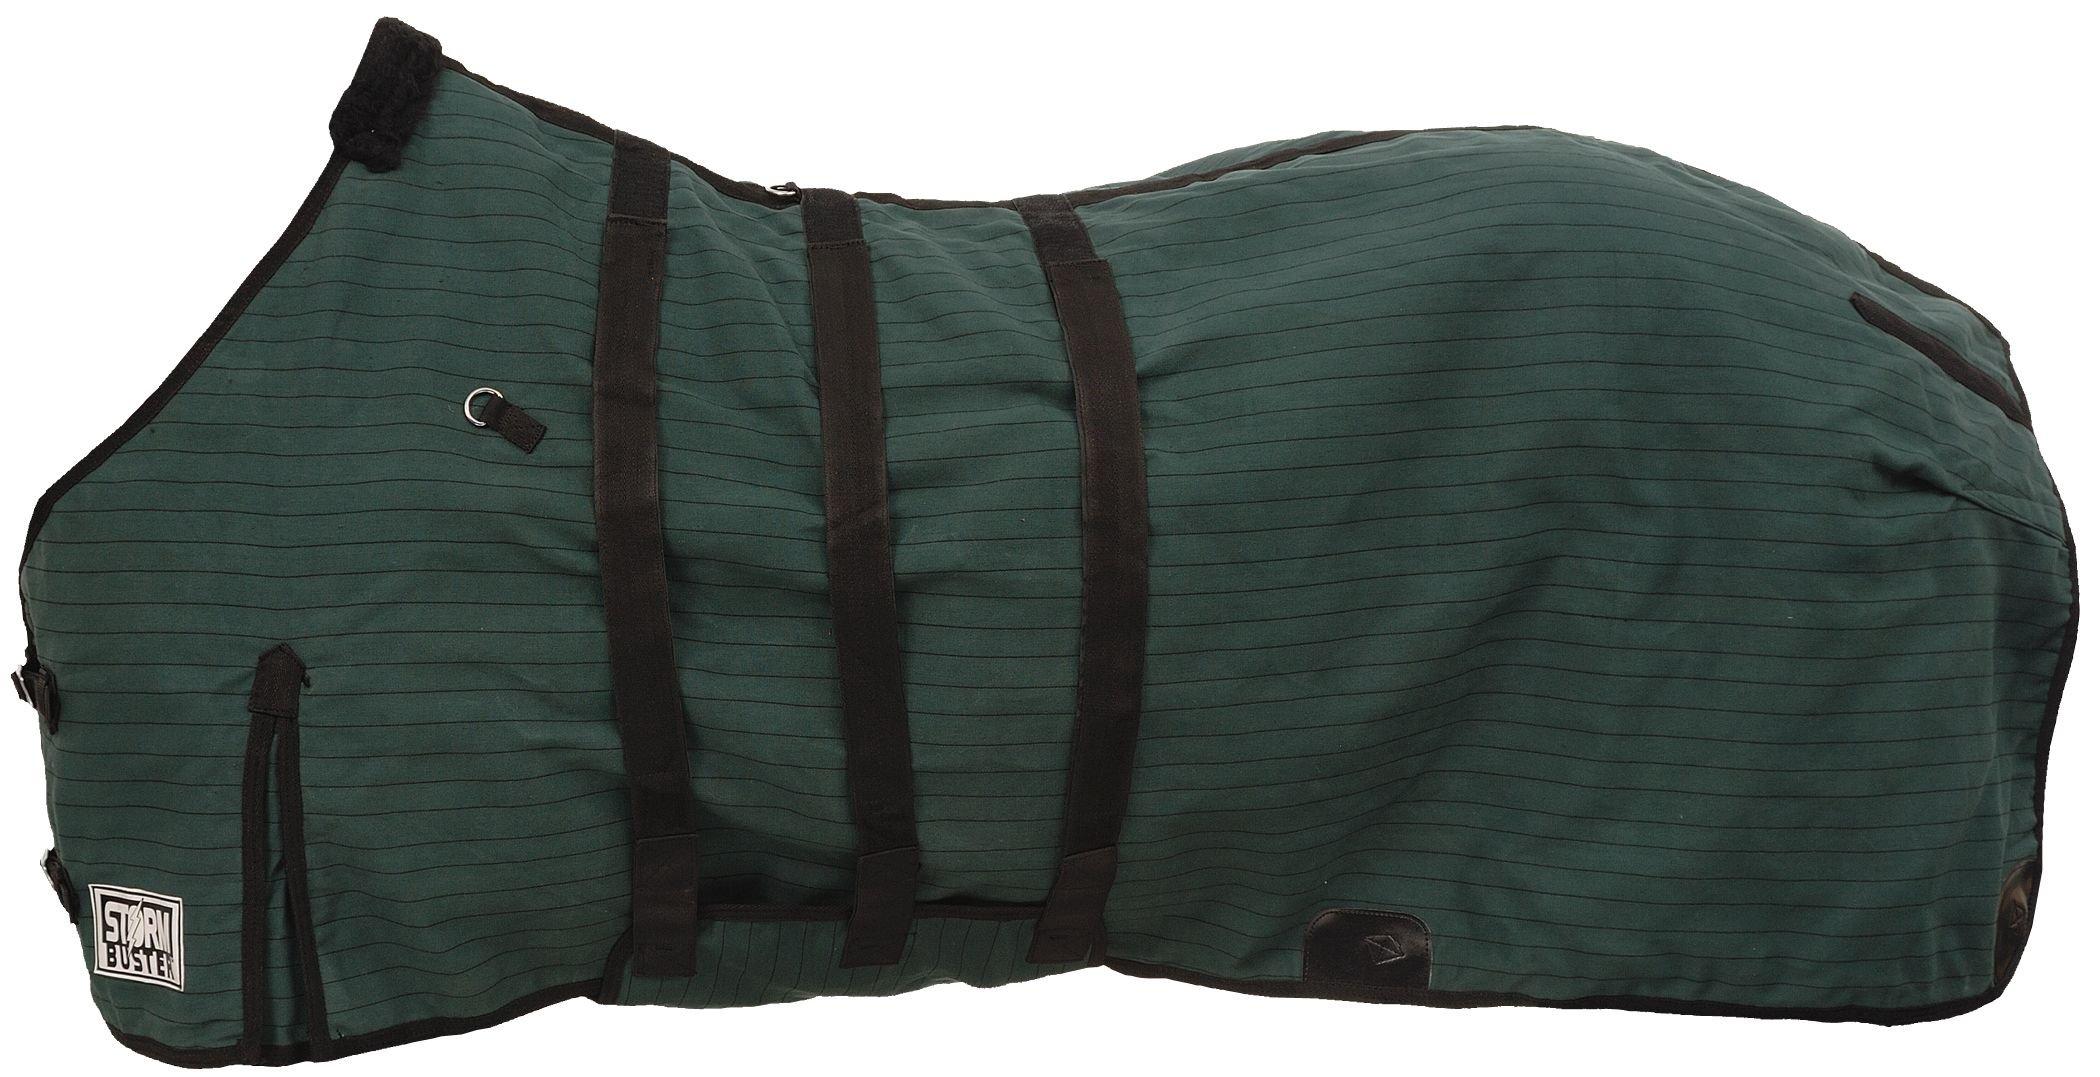 Tough 1 Storm-Buster Belly-Wrap Blanket, Hunter Green/Black, 78-Inch